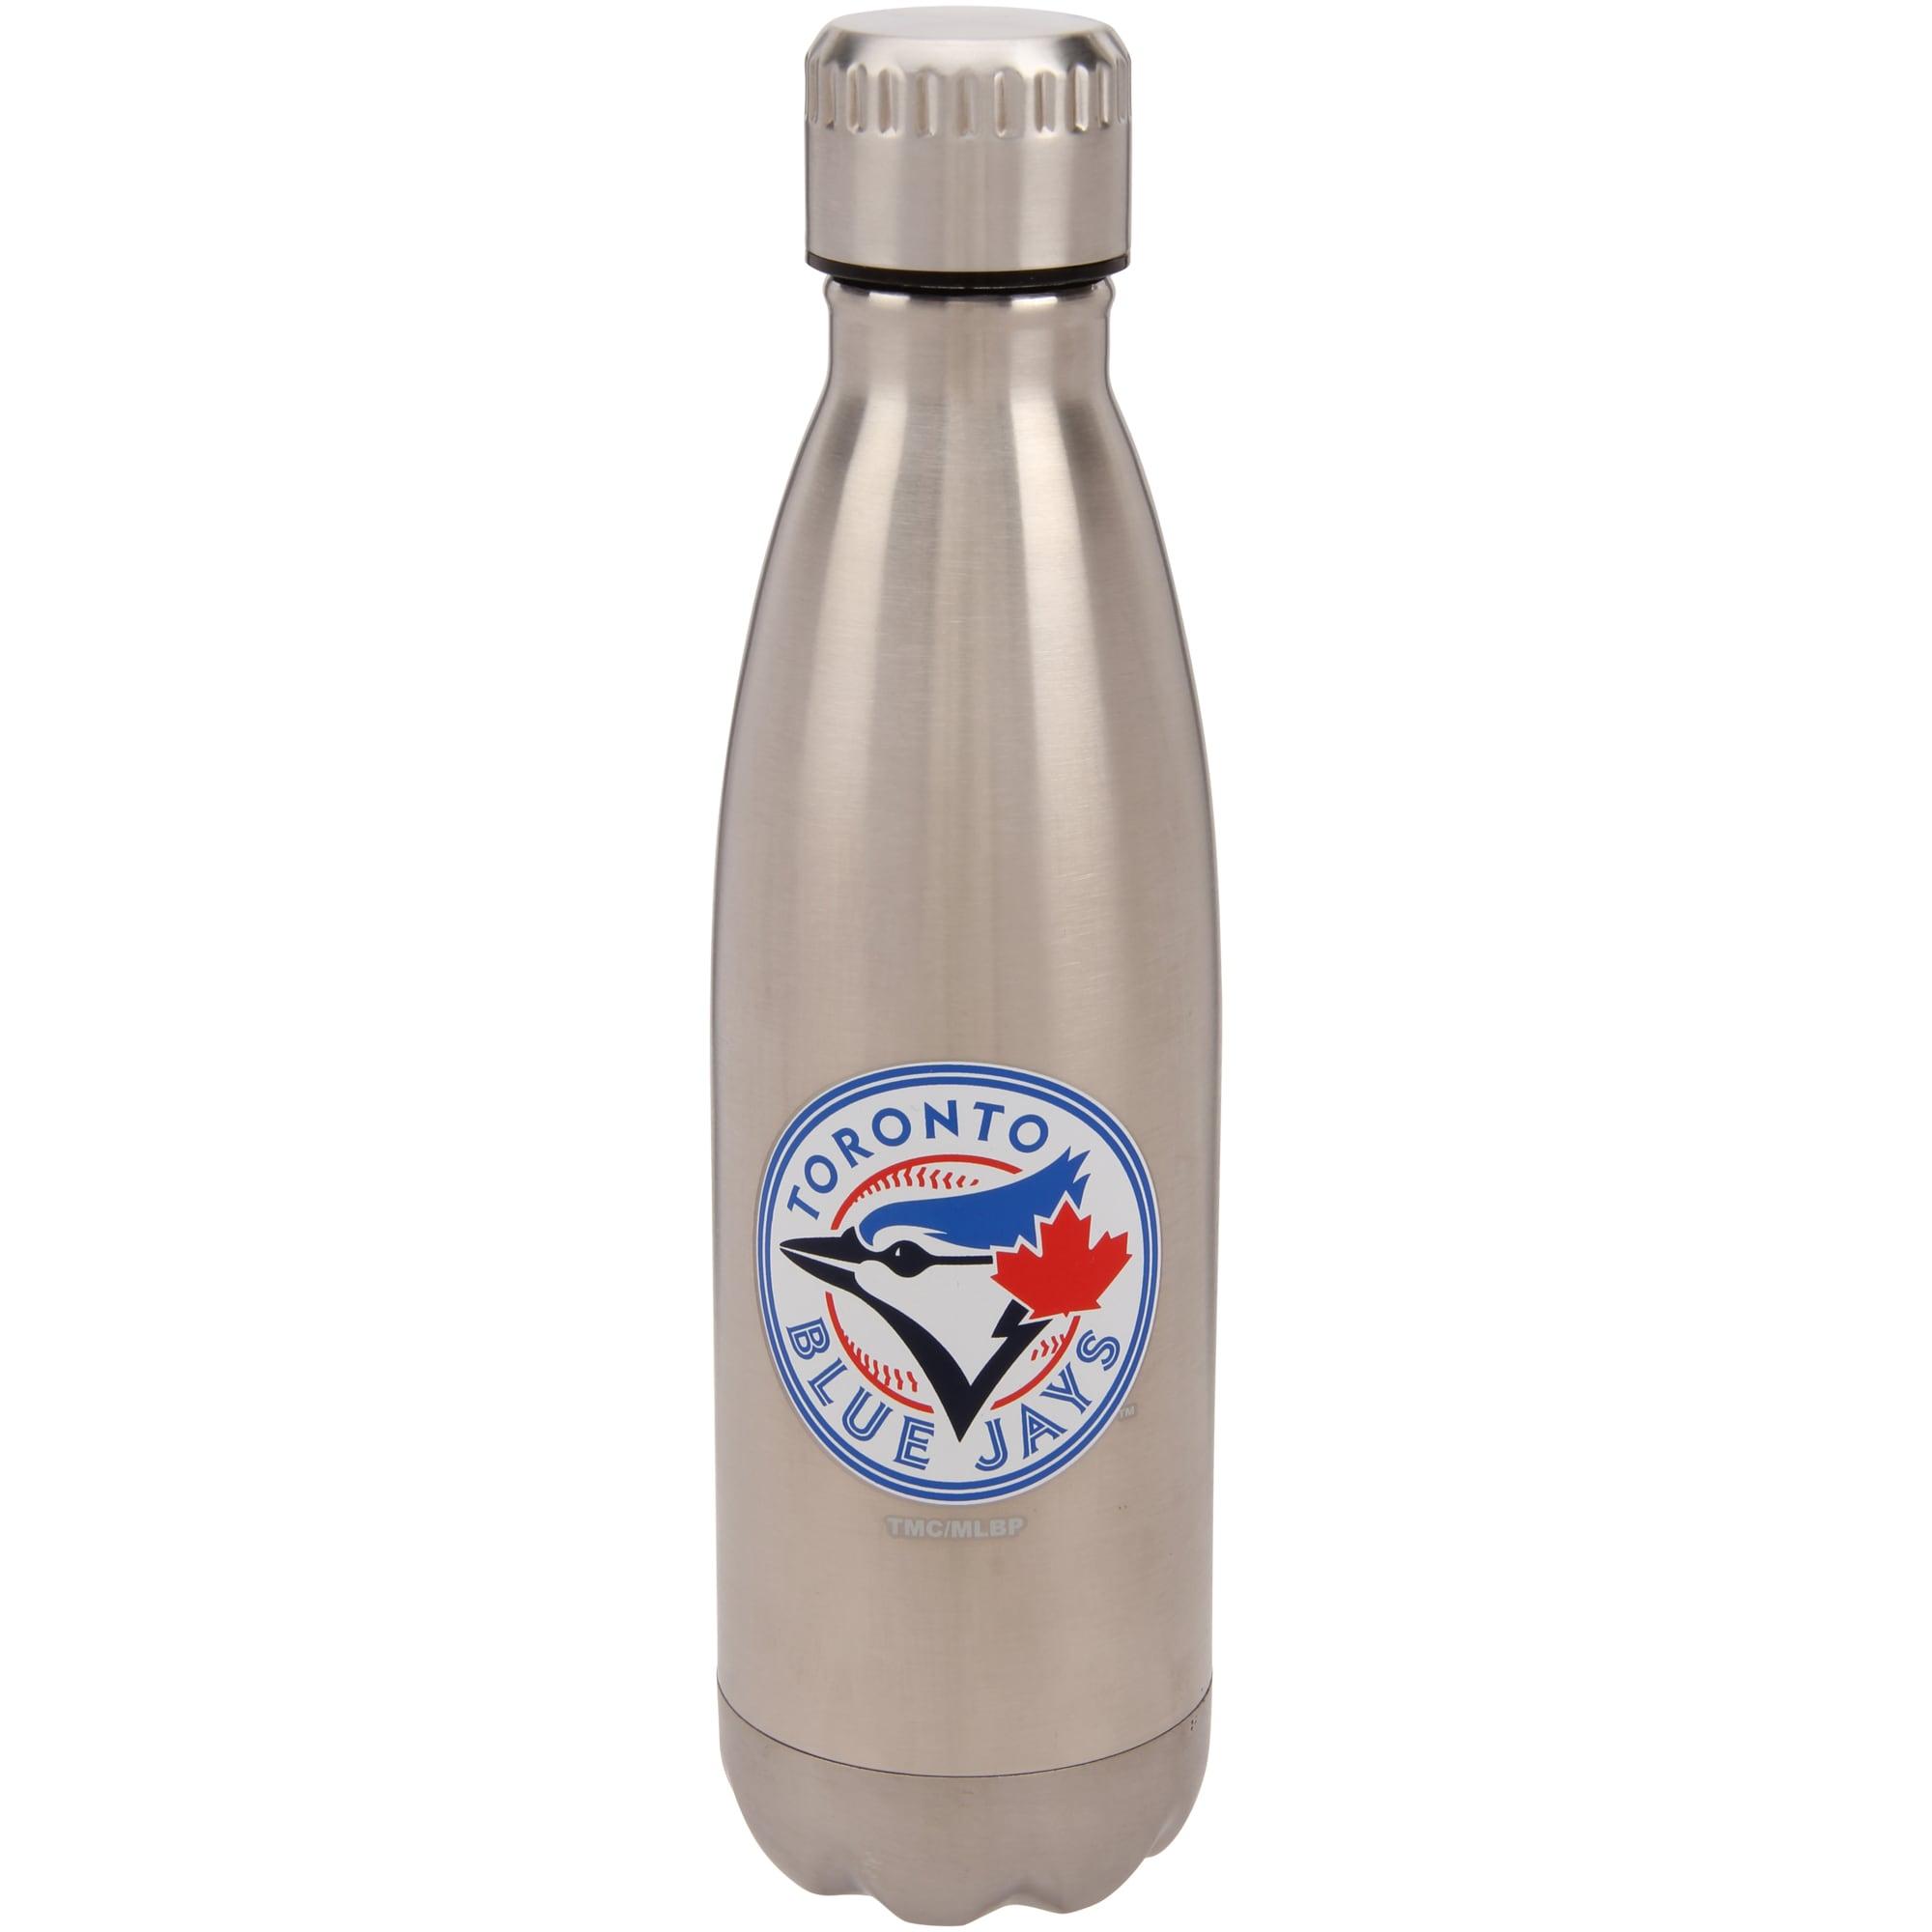 Toronto Blue Jays 16oz. Stainless Steel Water Bottle